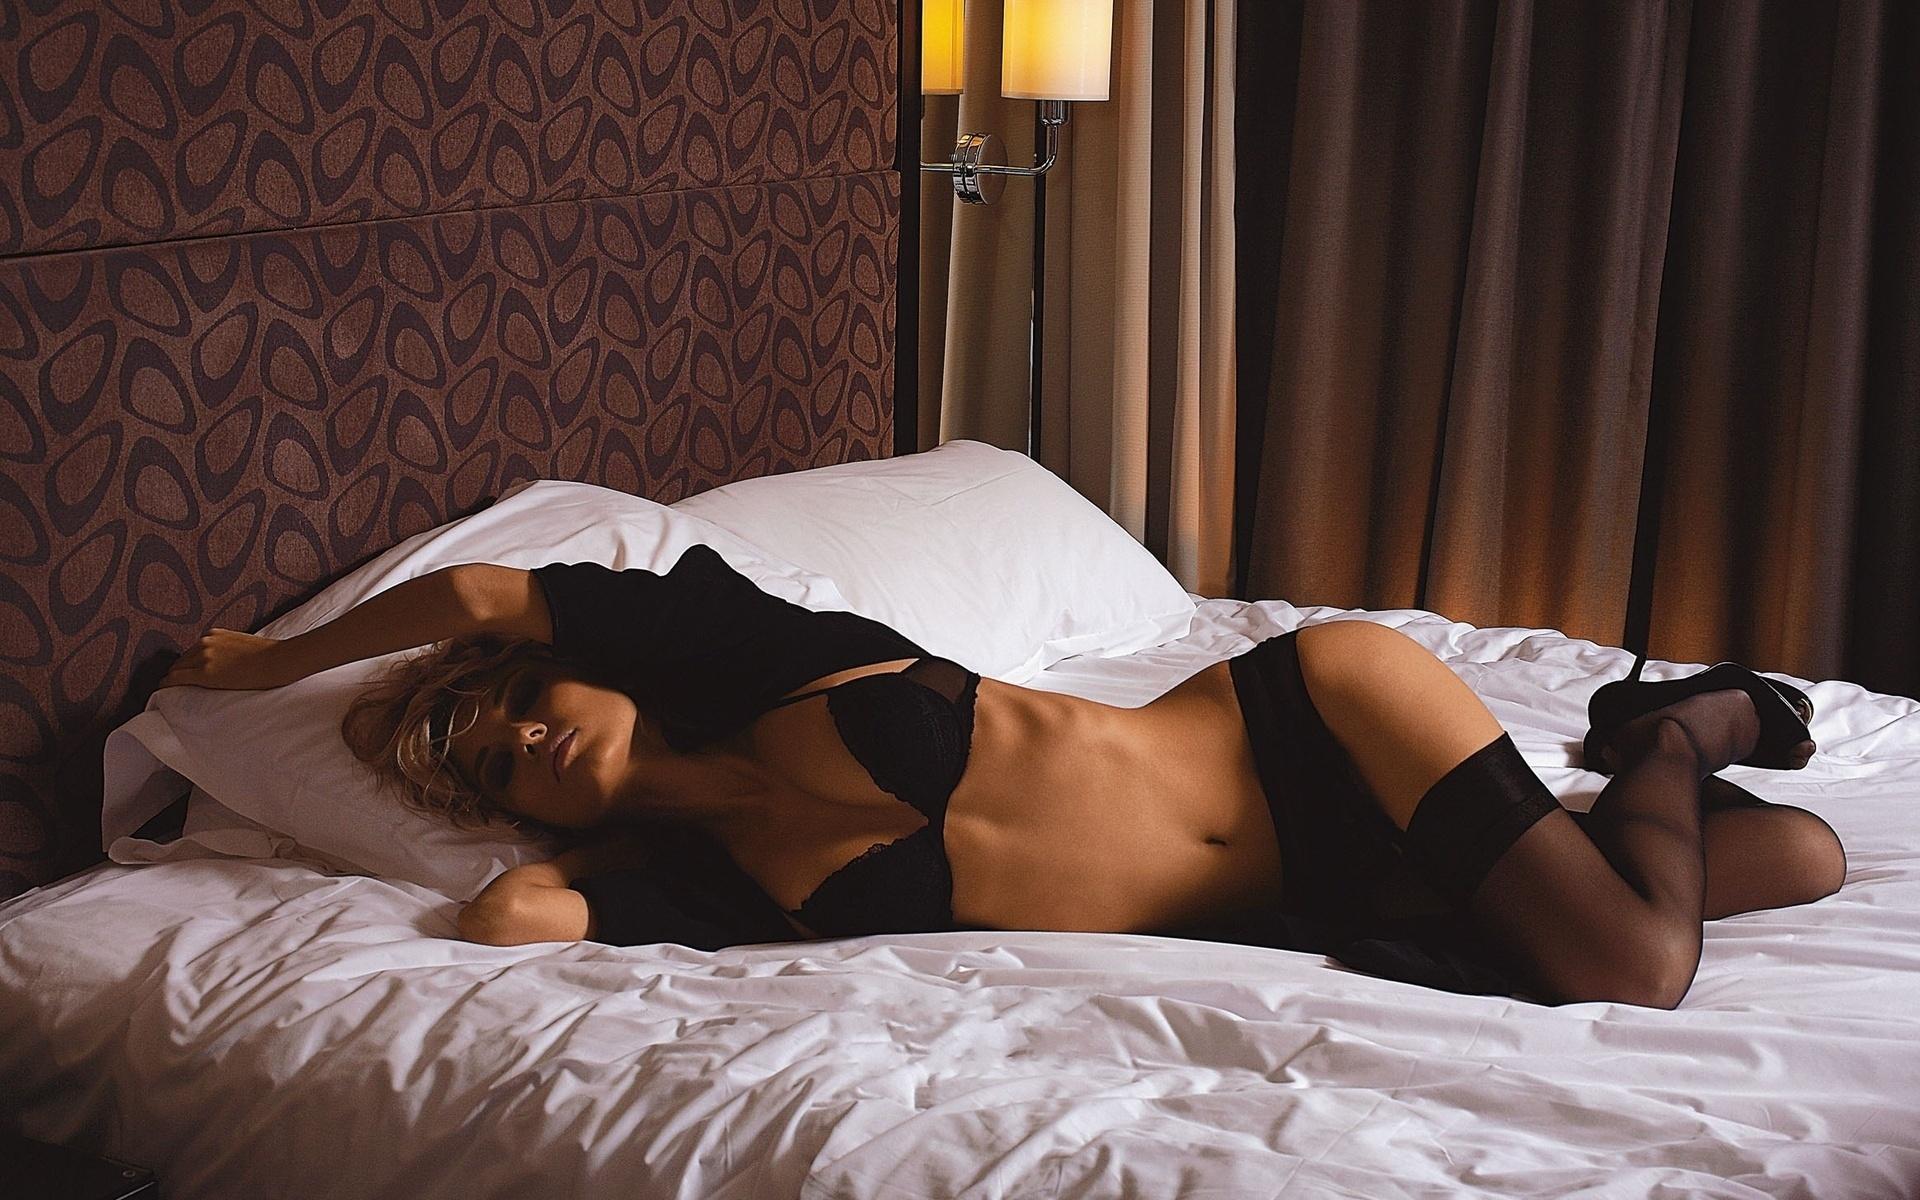 фото красотки на кровати